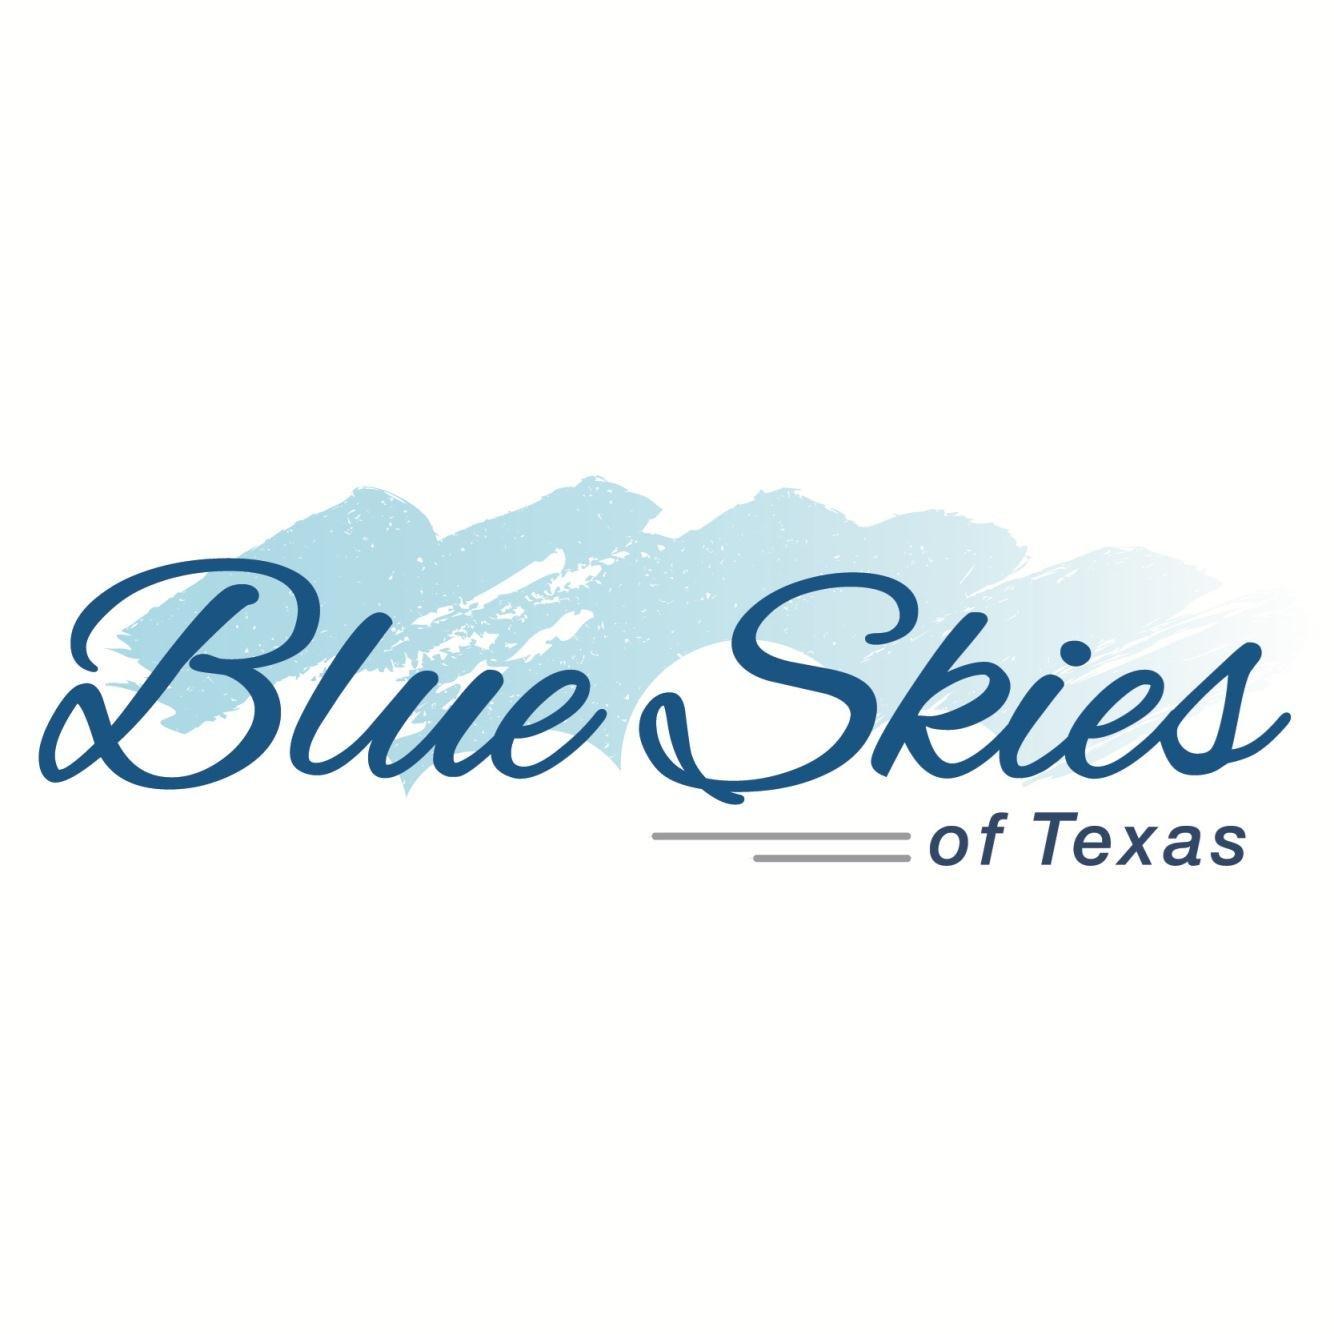 Blue Skies Of Texas >> Blue Skies Of Texas Blueskiestexas Twitter